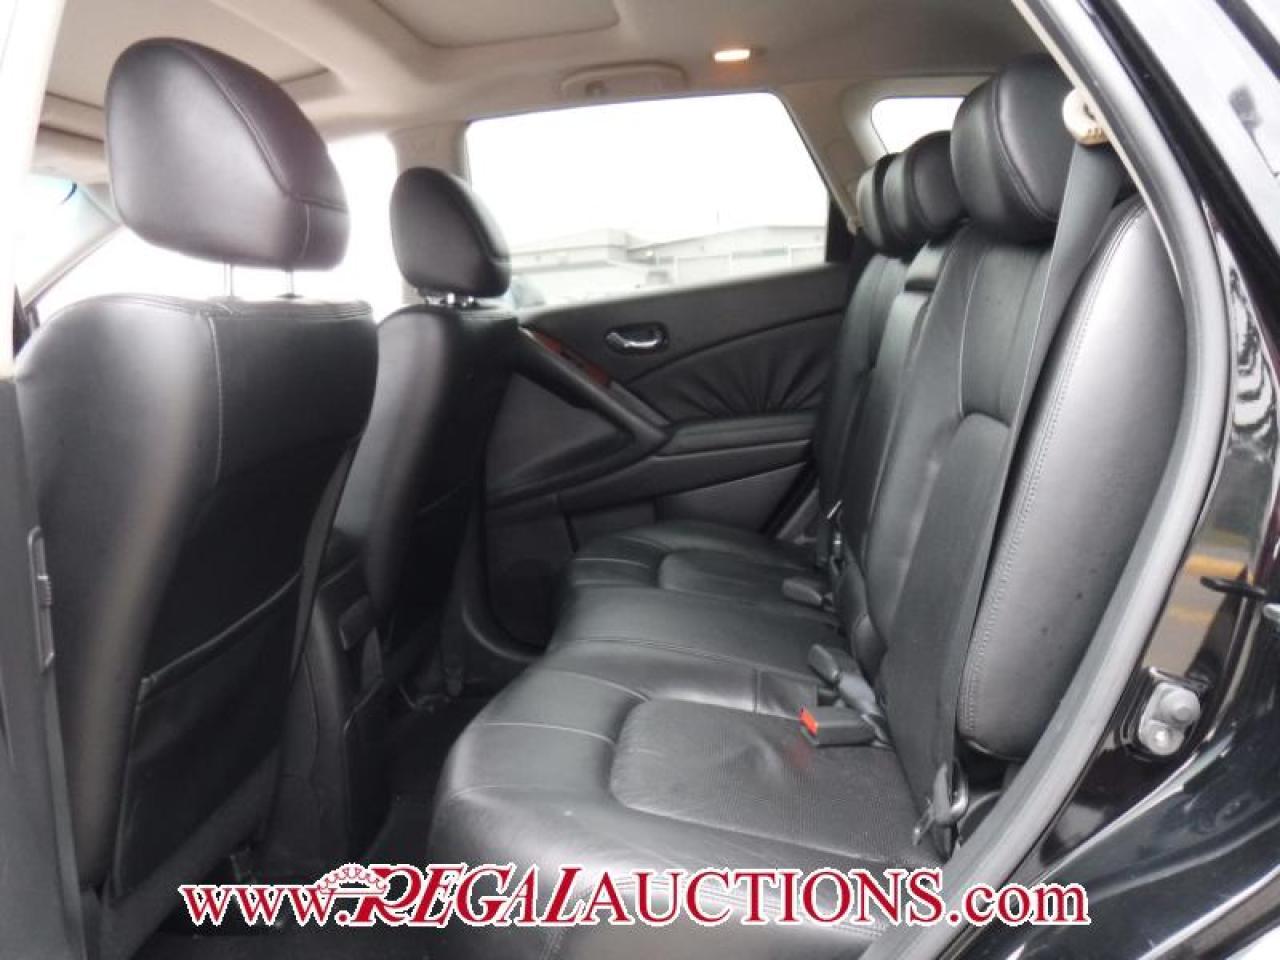 2009 Nissan MURANO LE 4D UTILITY AWD 3.5L